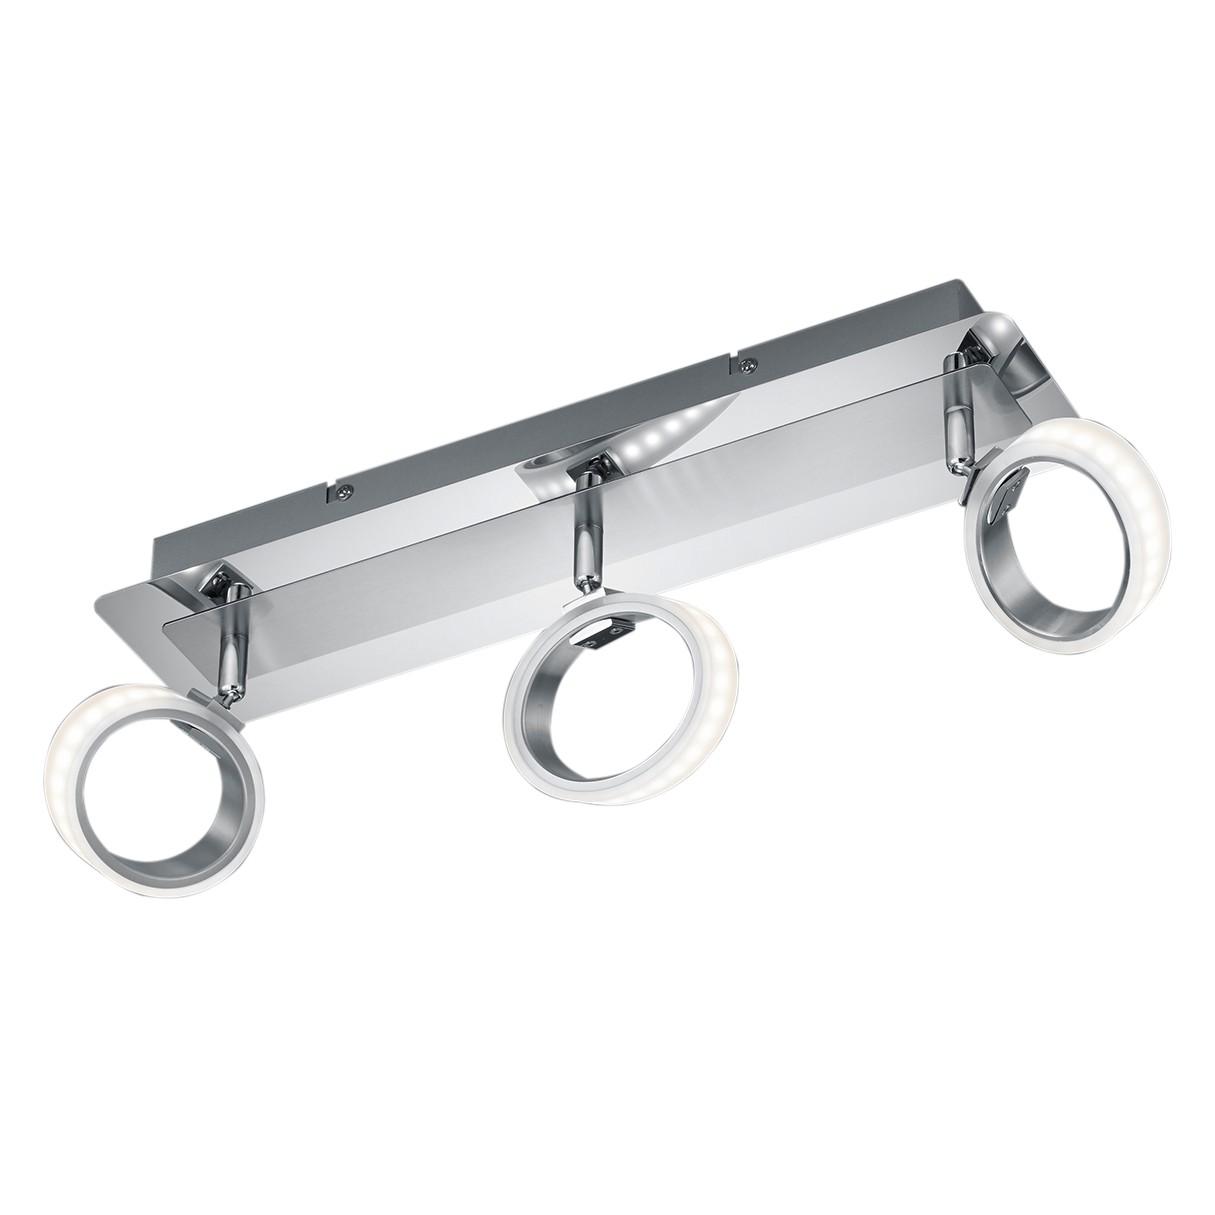 LED-Deckenleuchte Corland ● Metall / Acryl ● 3- Trio A+